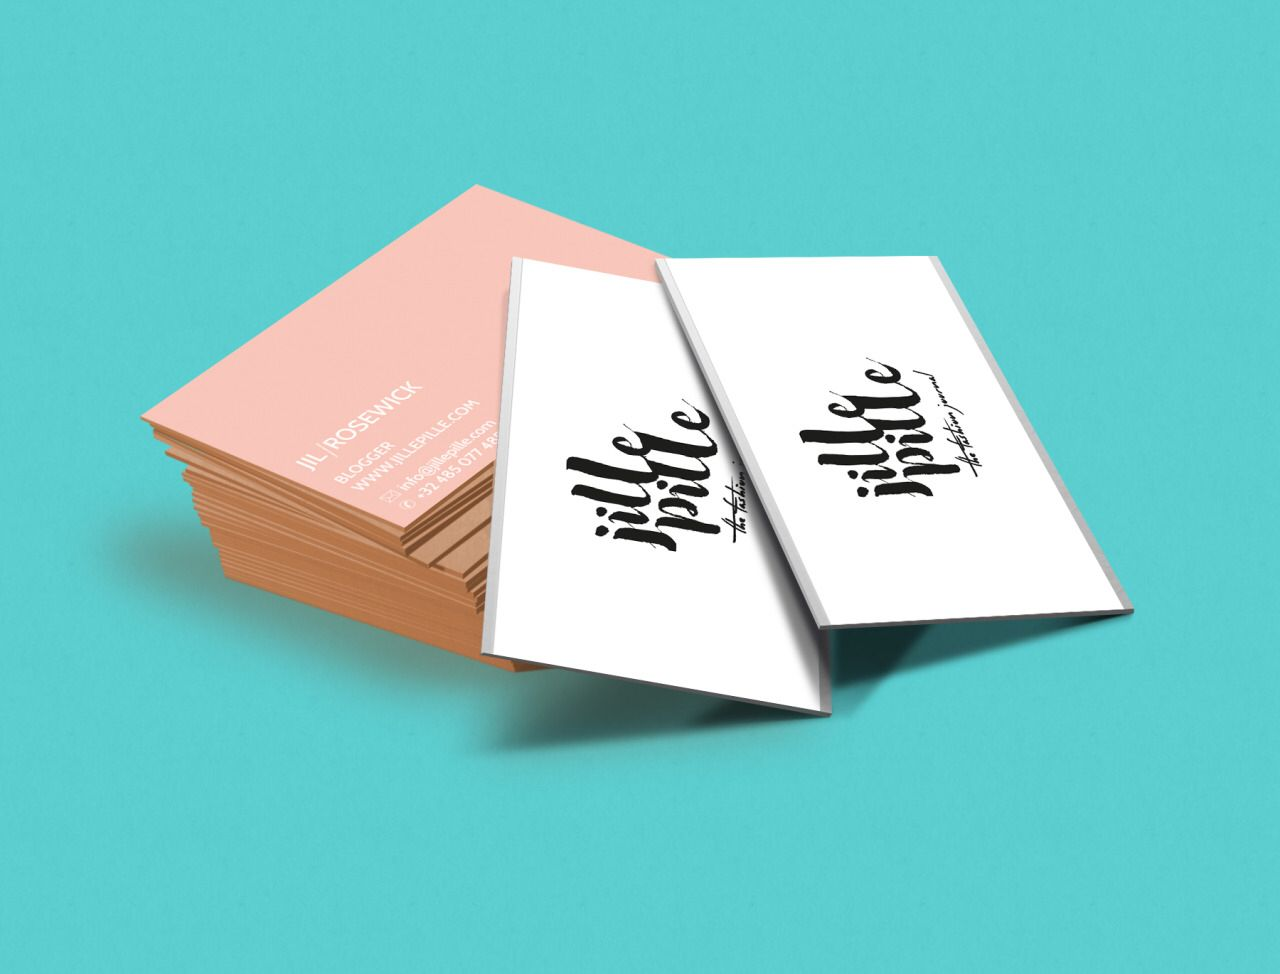 jillepille business card with silver optics. mndyhrmns.tumblr.com ...